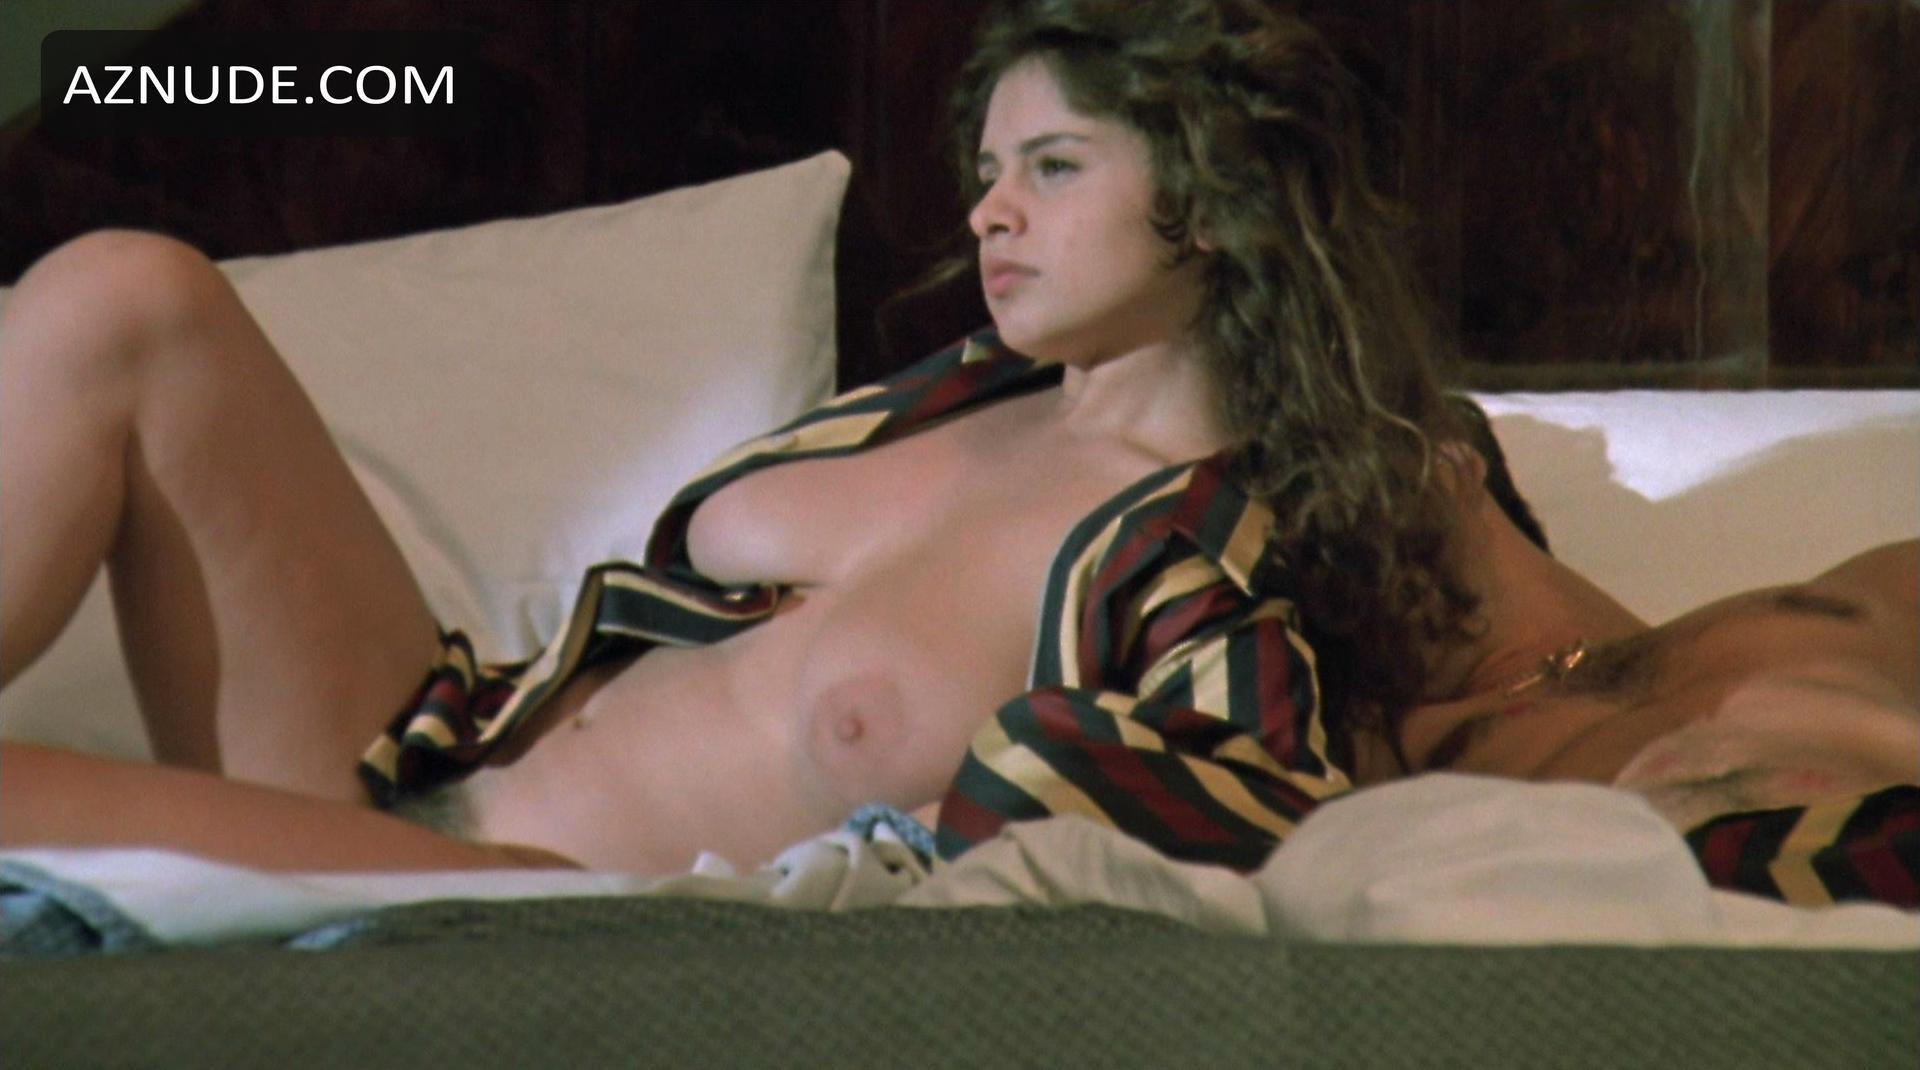 Thandie newton nude sex scene in half of a yellow sun movie 5